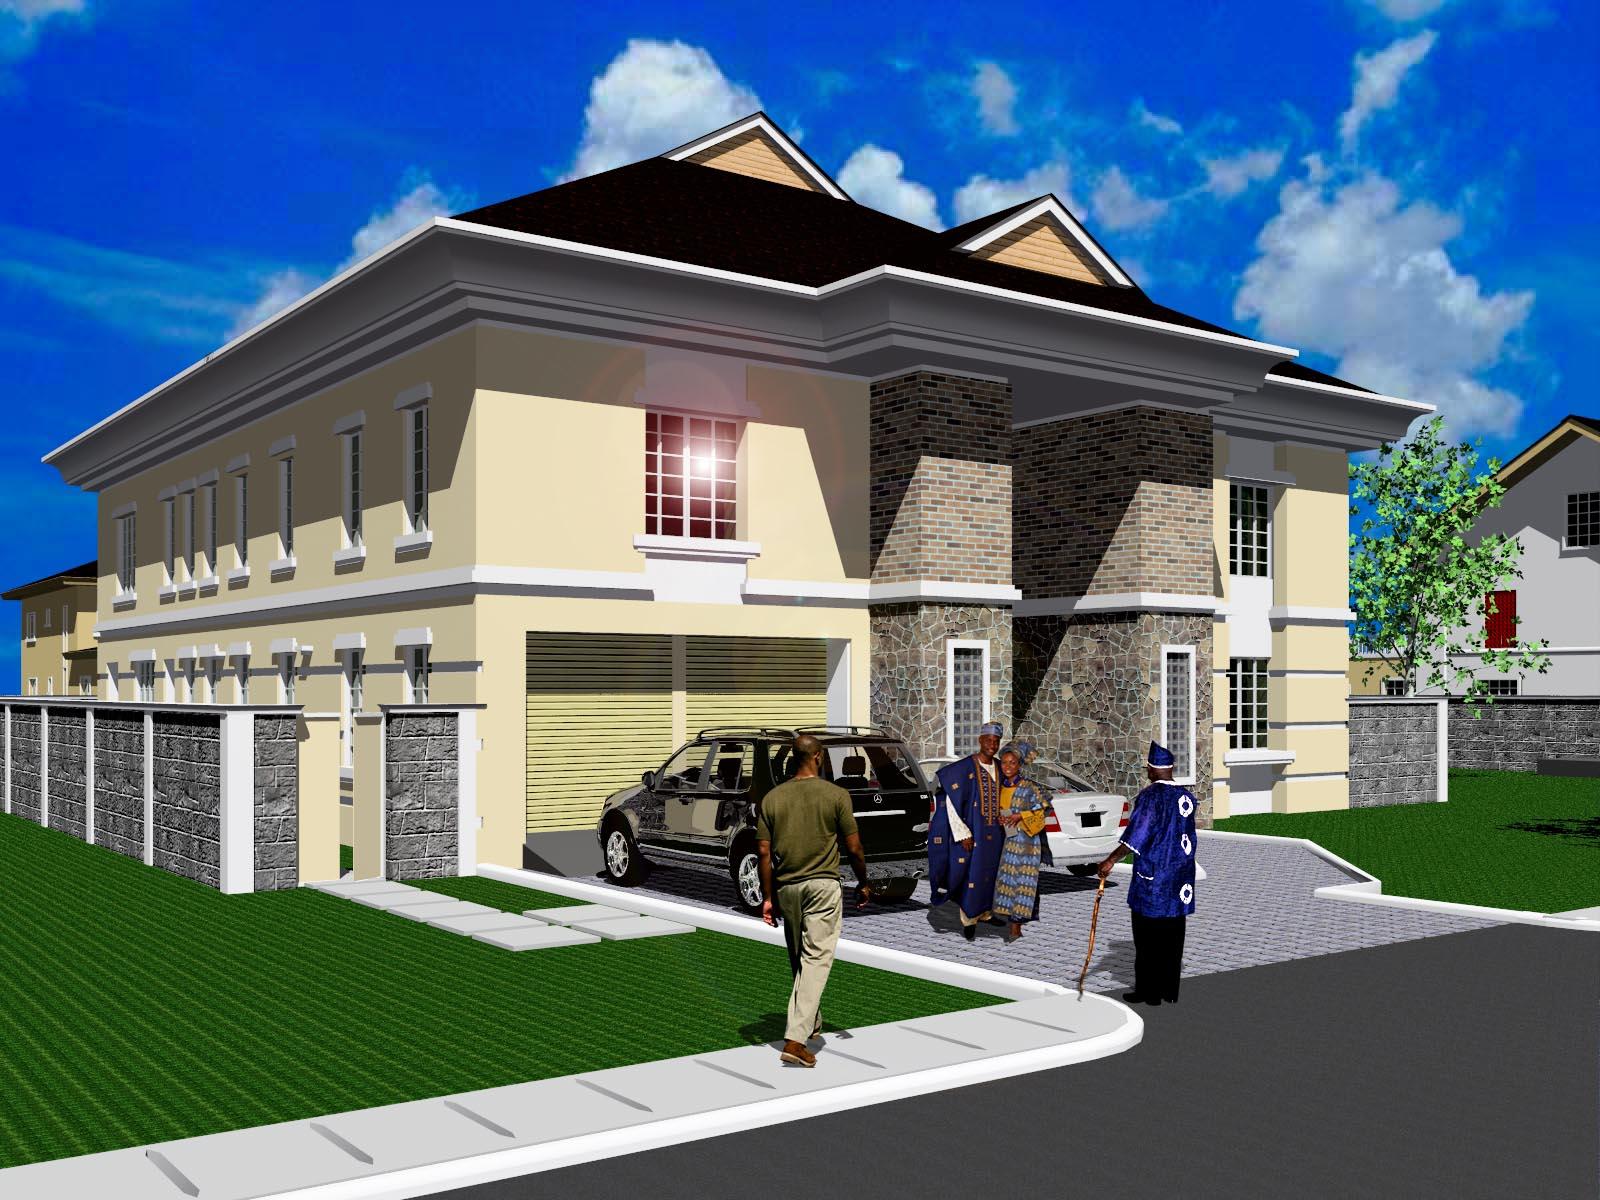 Adiatu oluwafemi models my 3d models both autocad and for Revit architecture modern house design 8